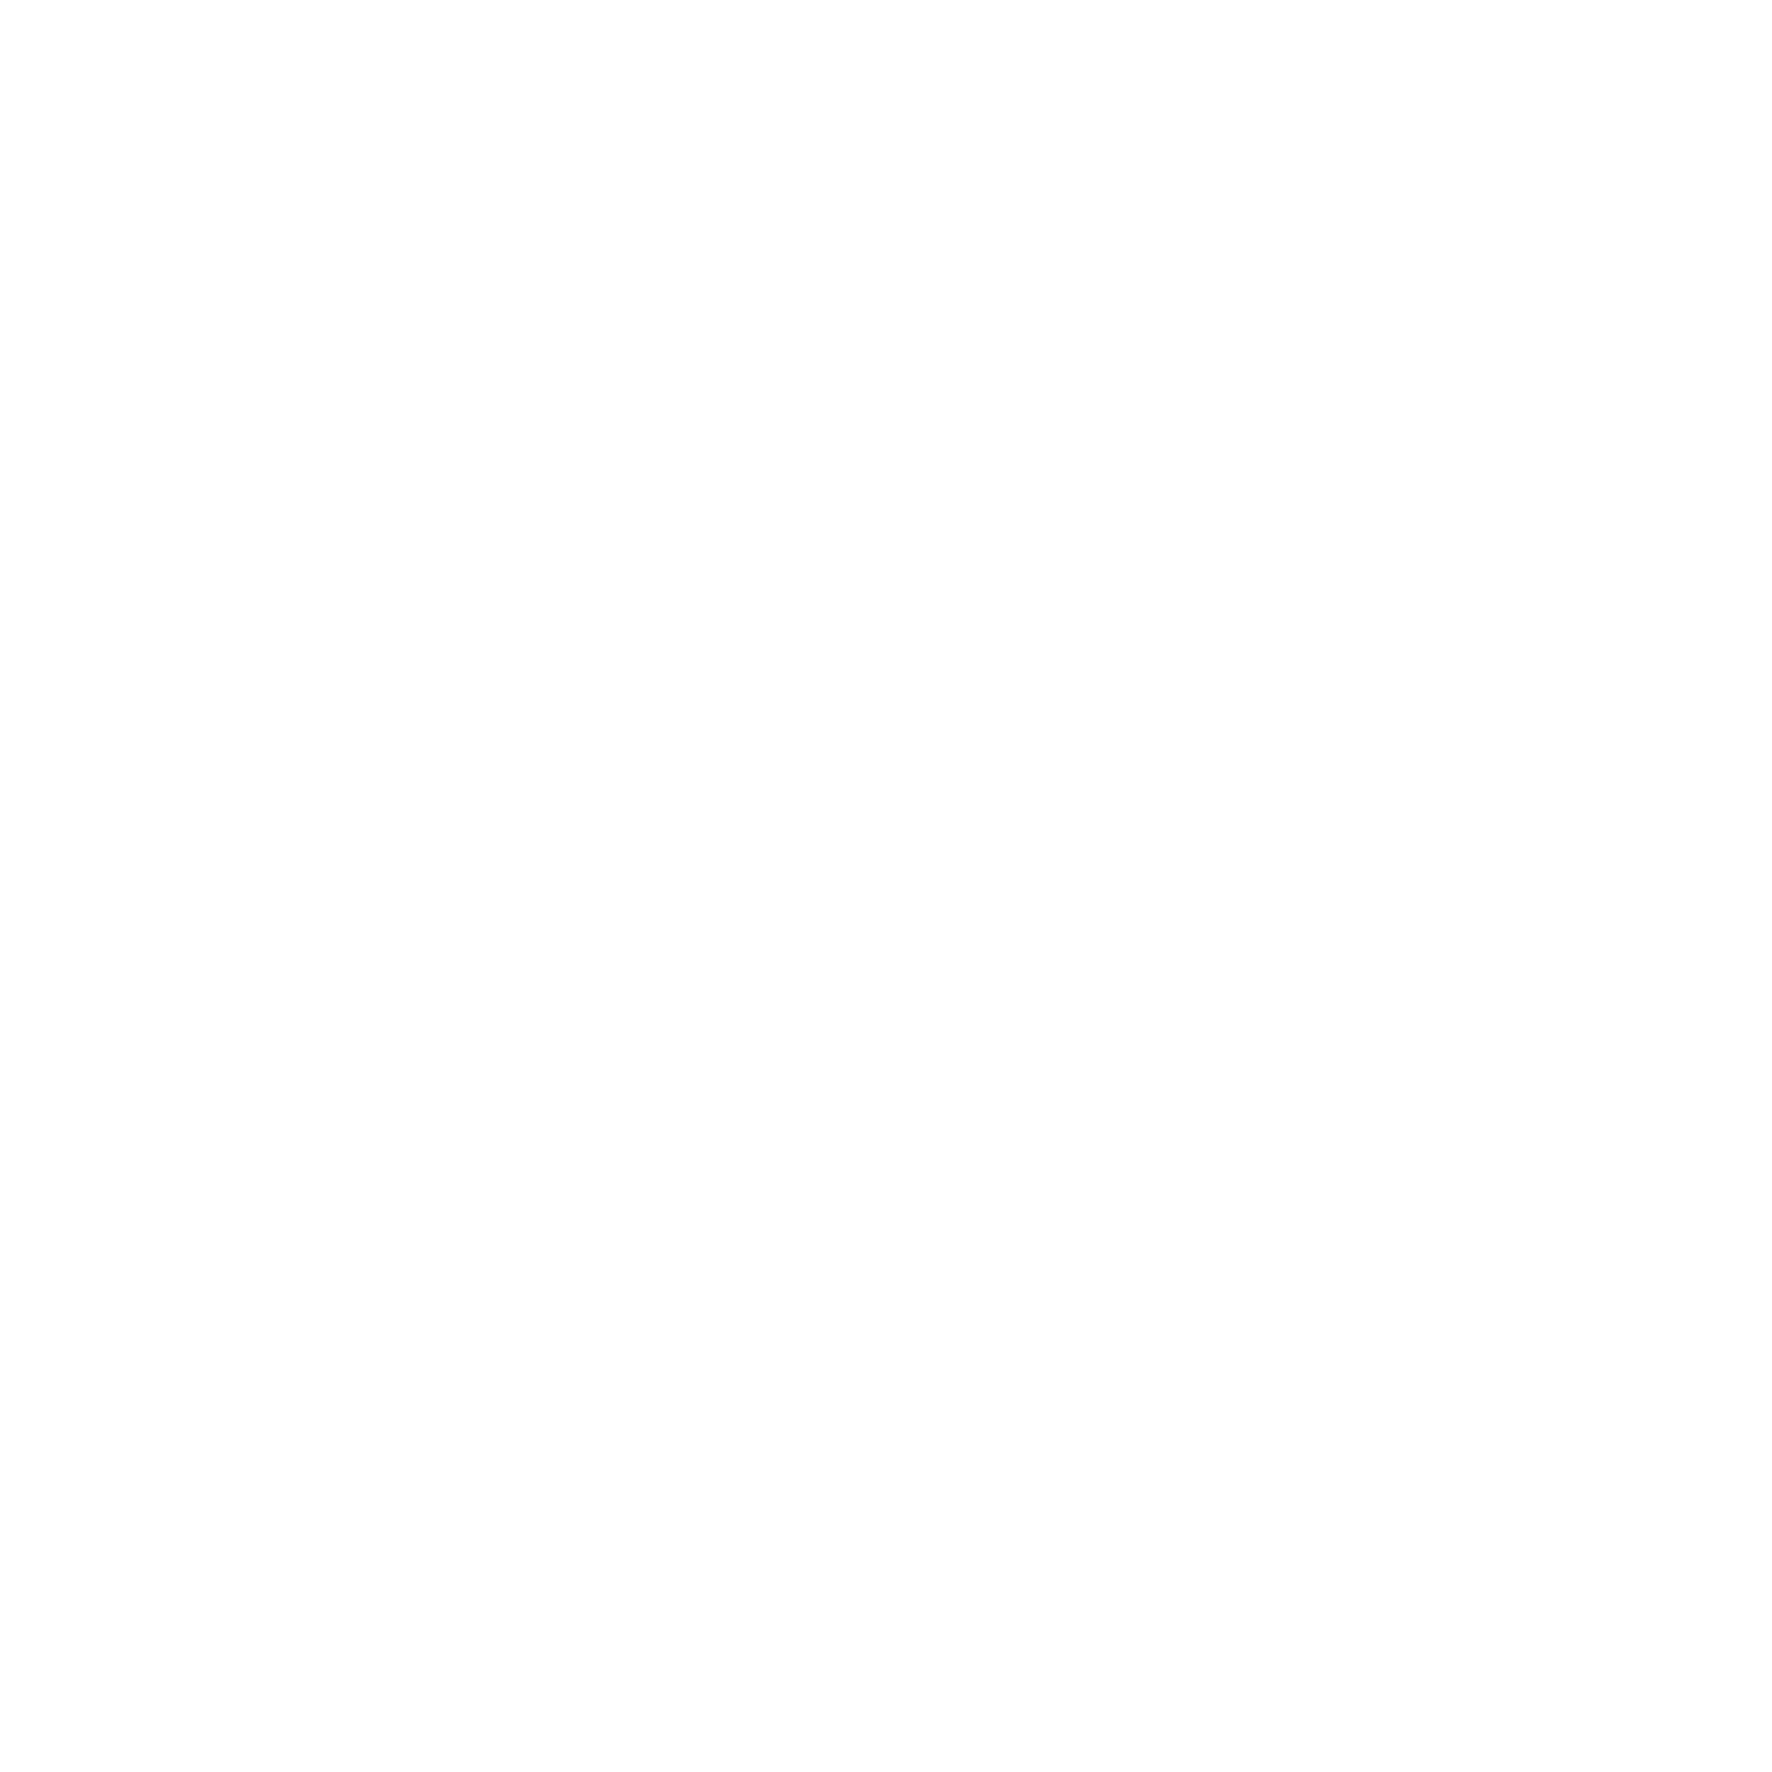 Factorhy